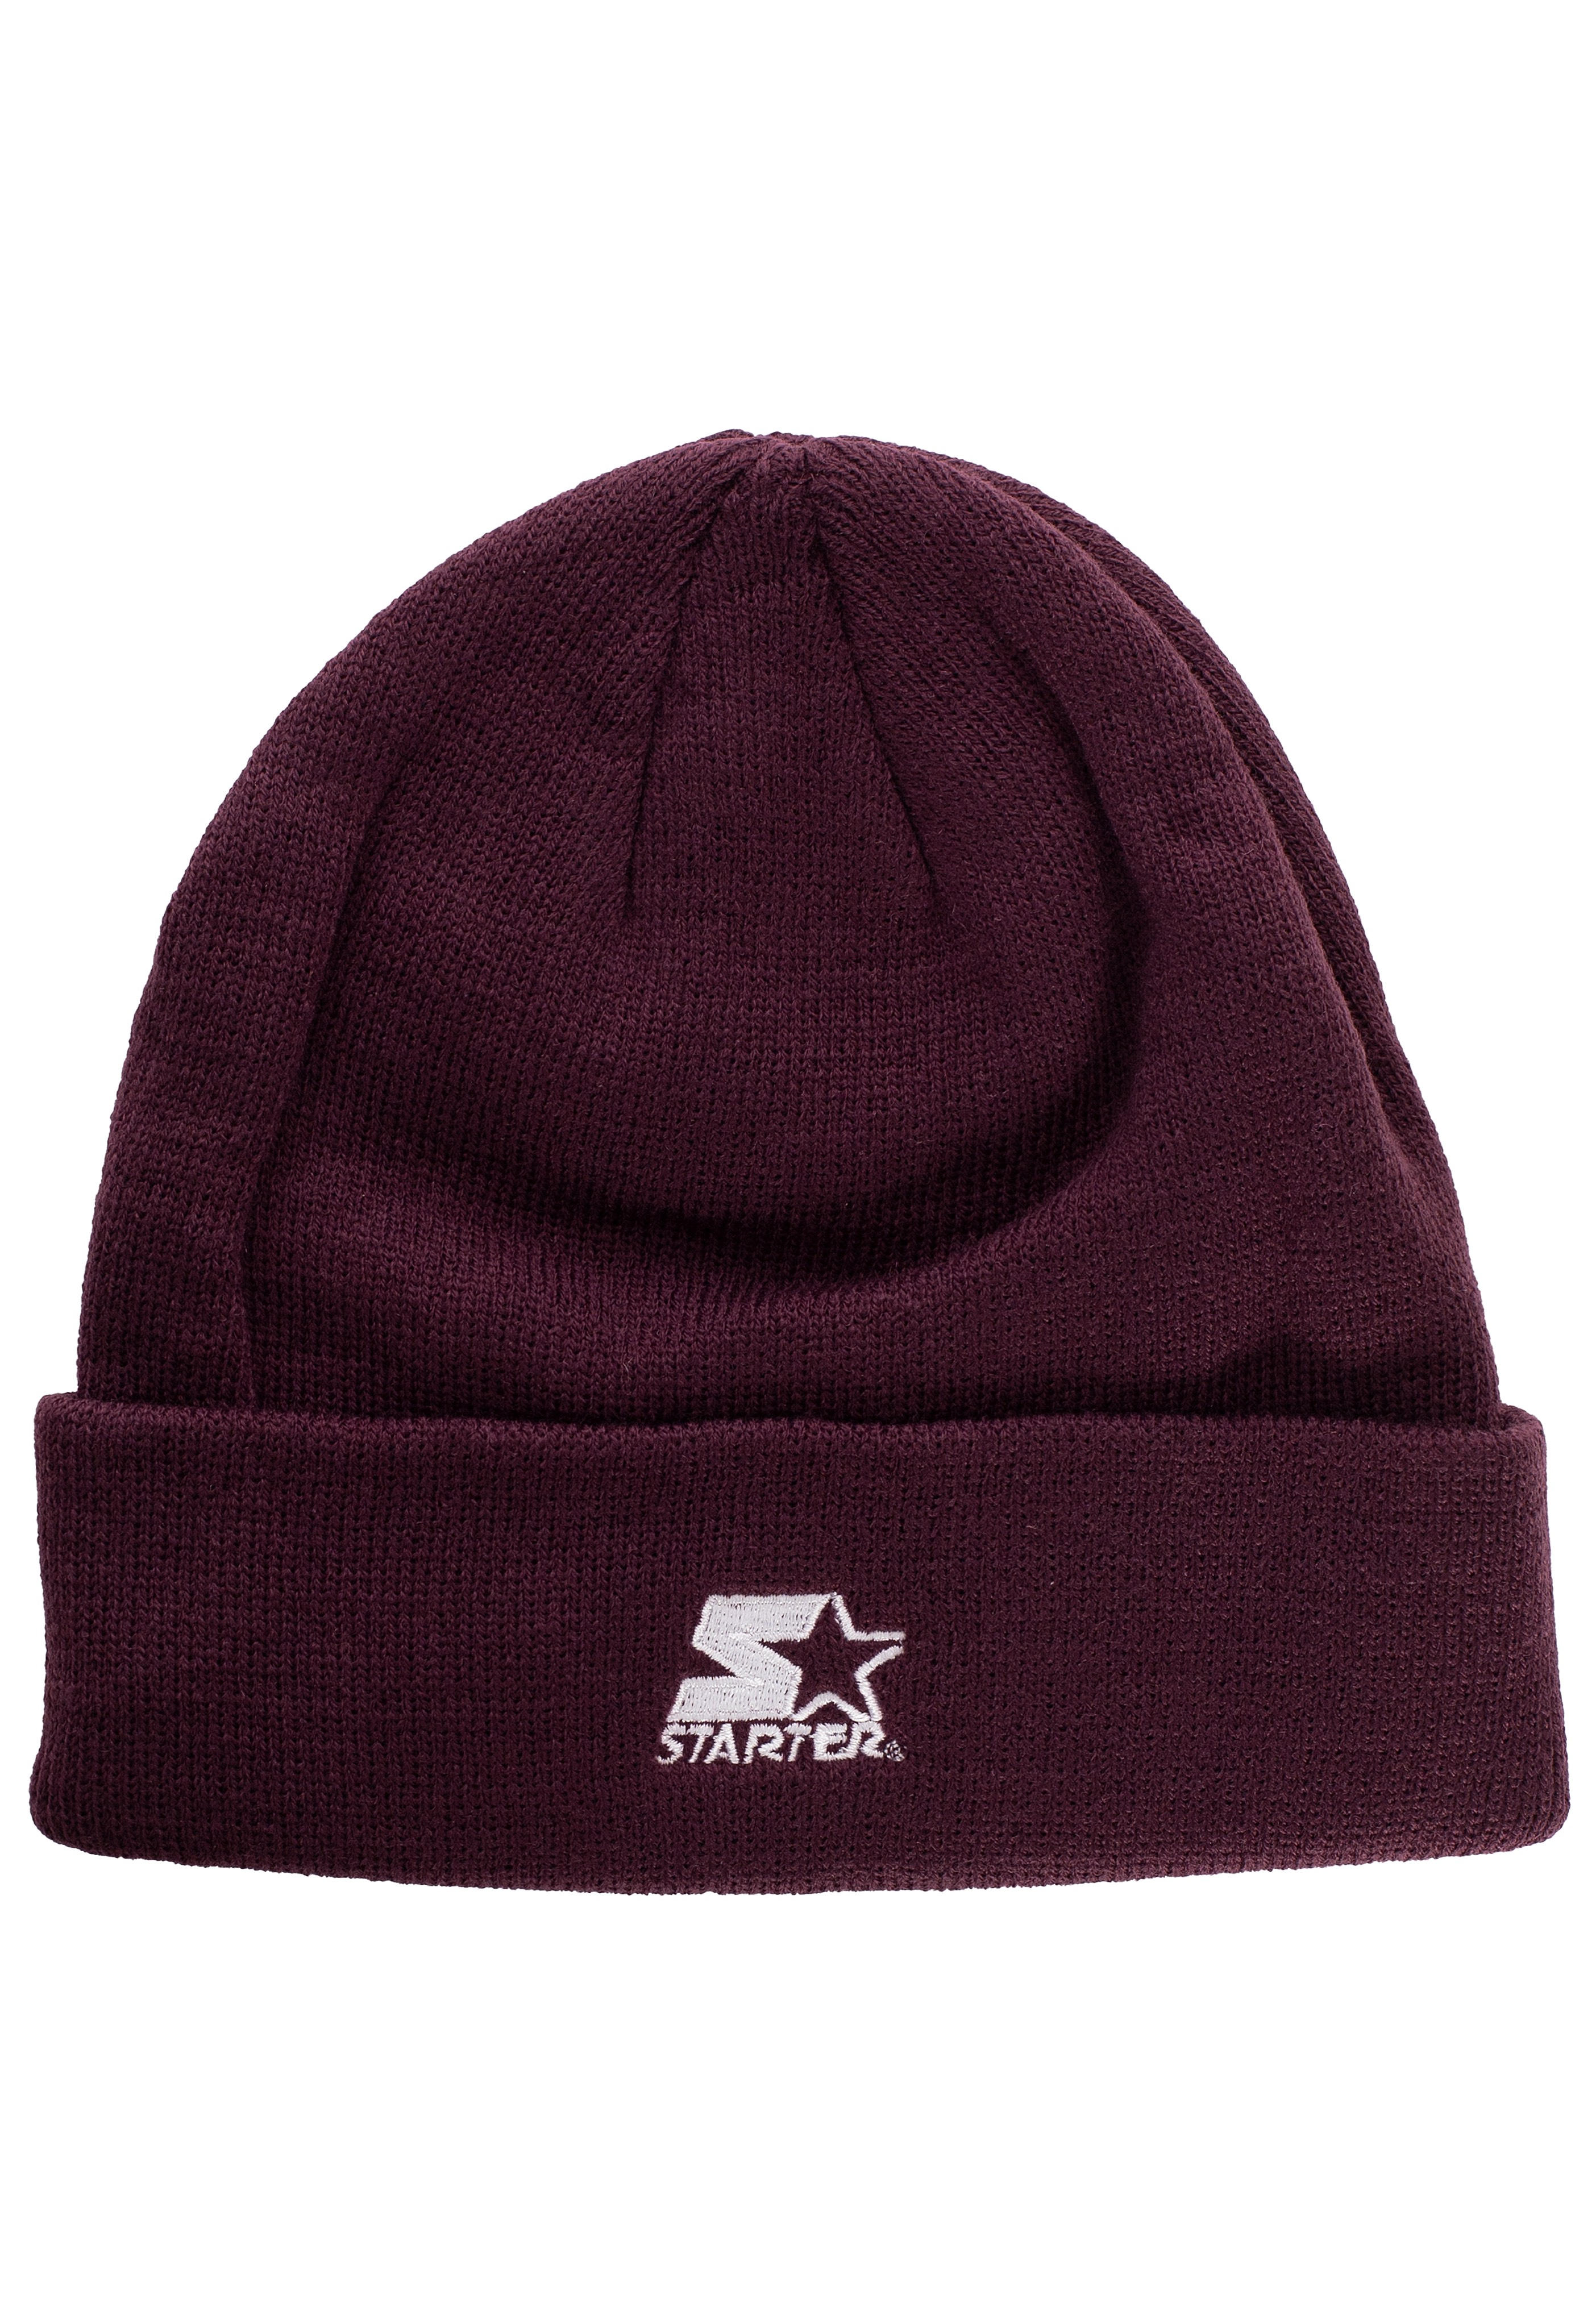 Starter - Logo Darkviolet - Beanies